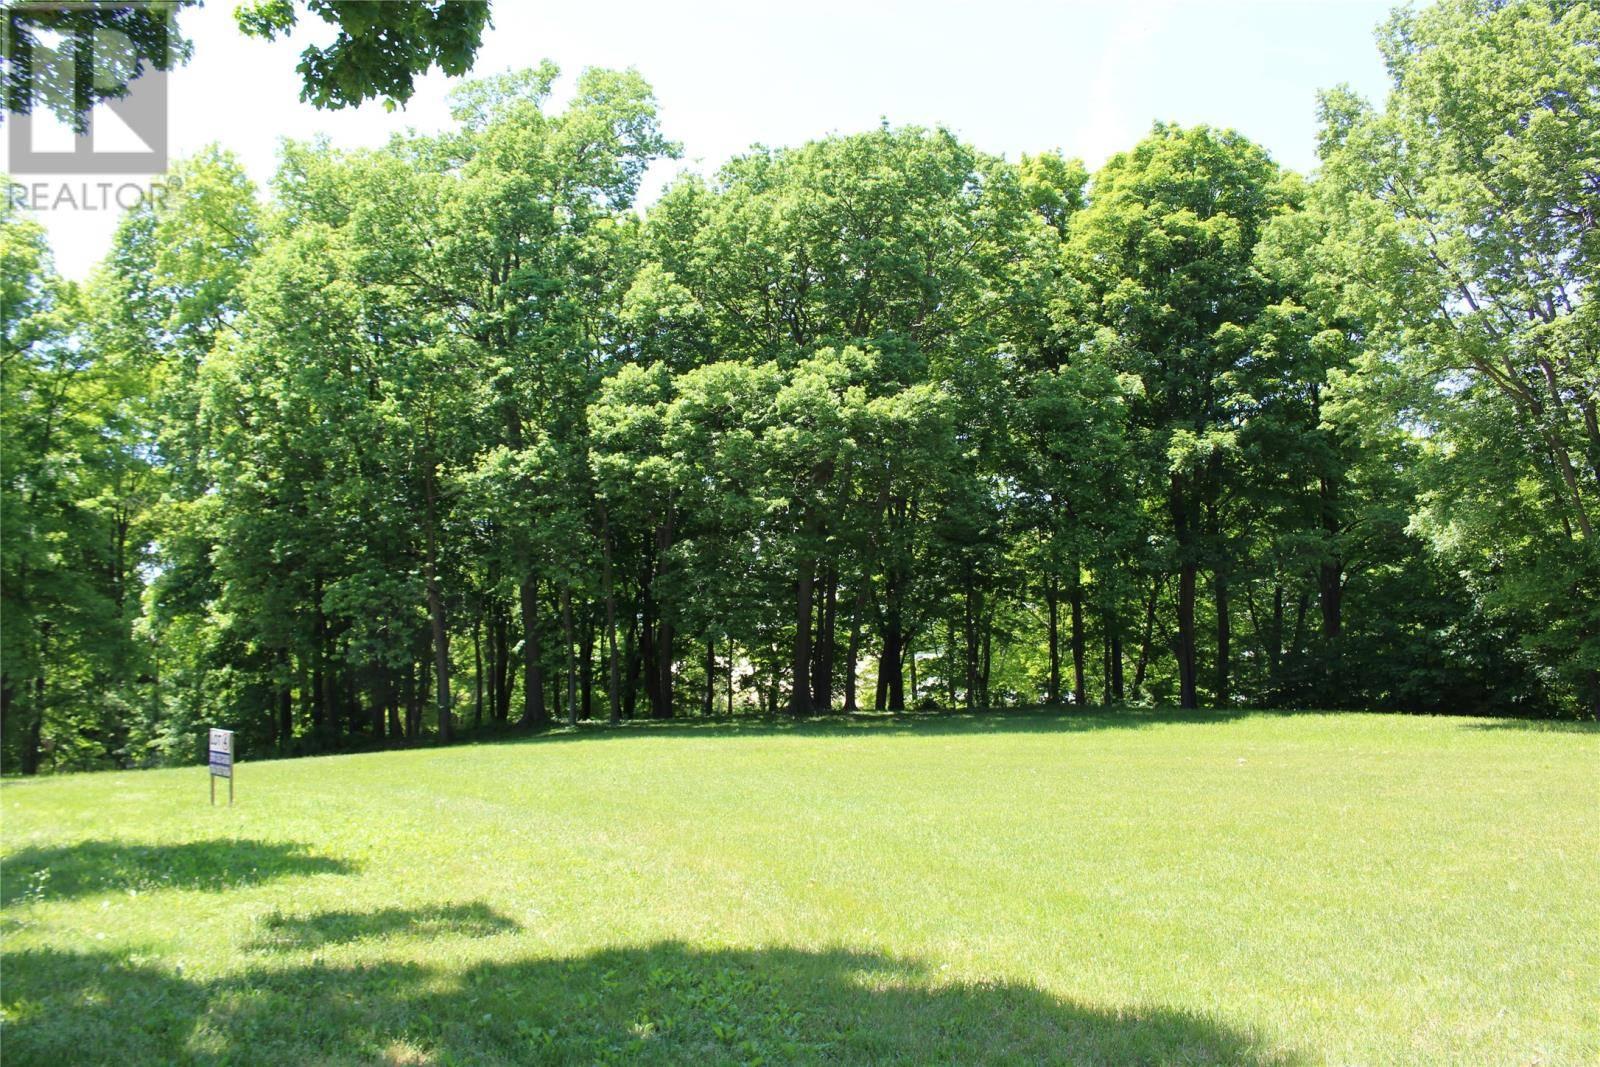 Residential property for sale at 0 Oakglen  Unit 4 Kingsville Ontario - MLS: 1400639